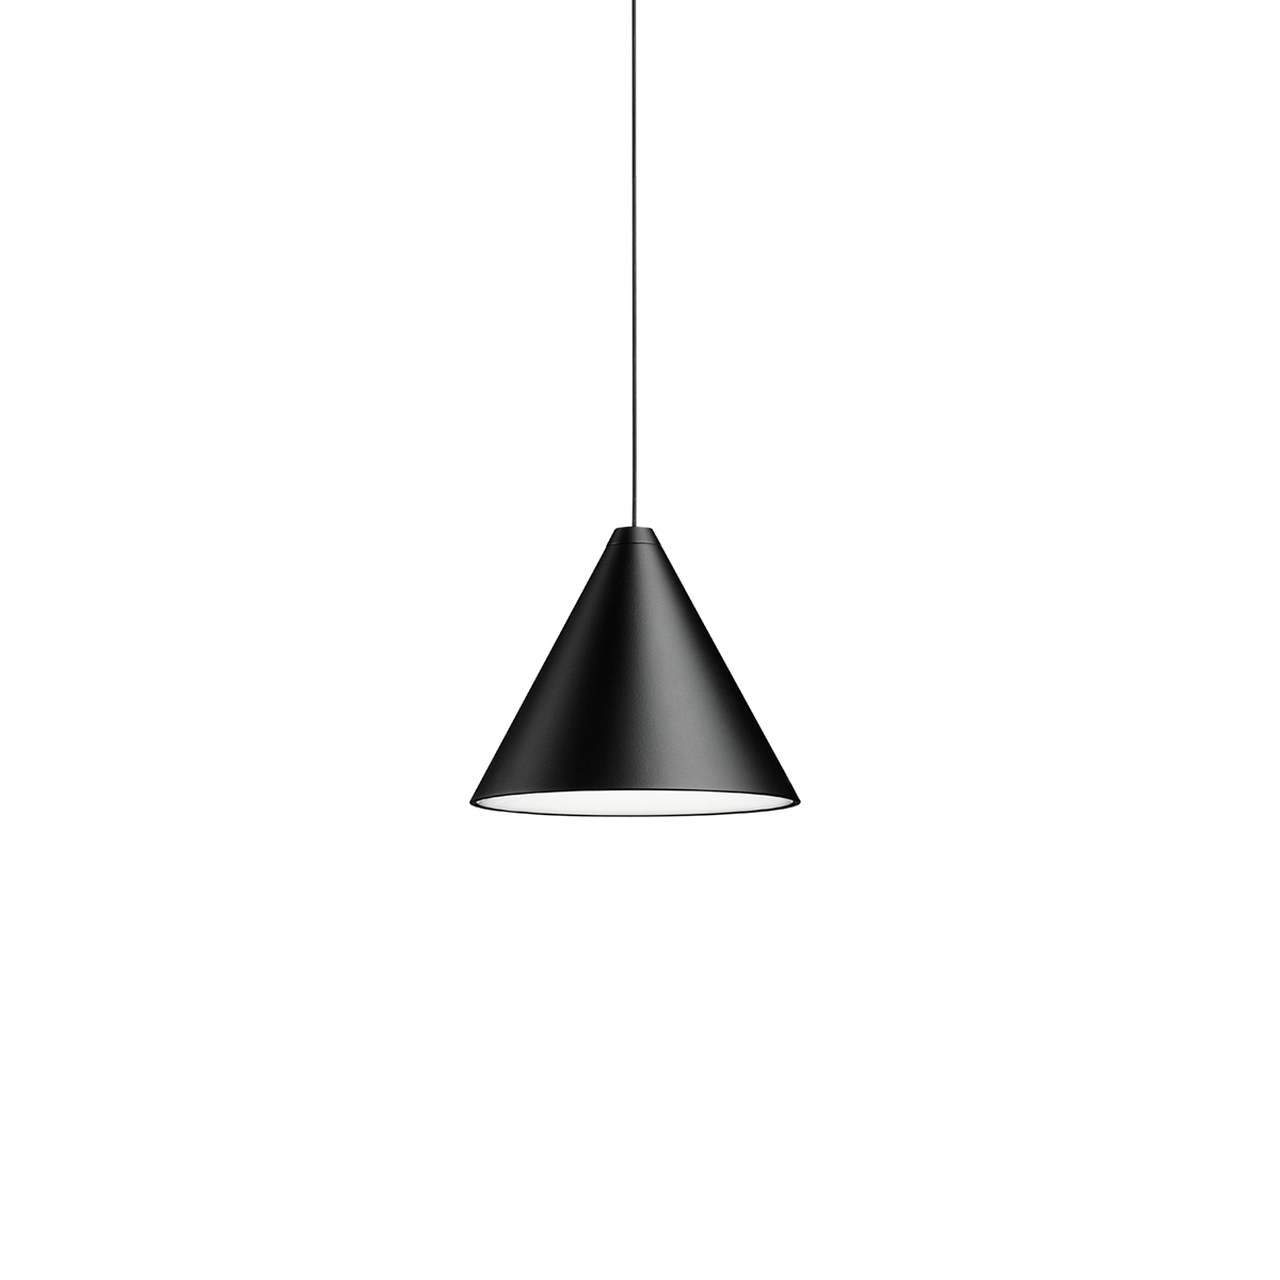 small resolution of string lights cone michael anastassiades